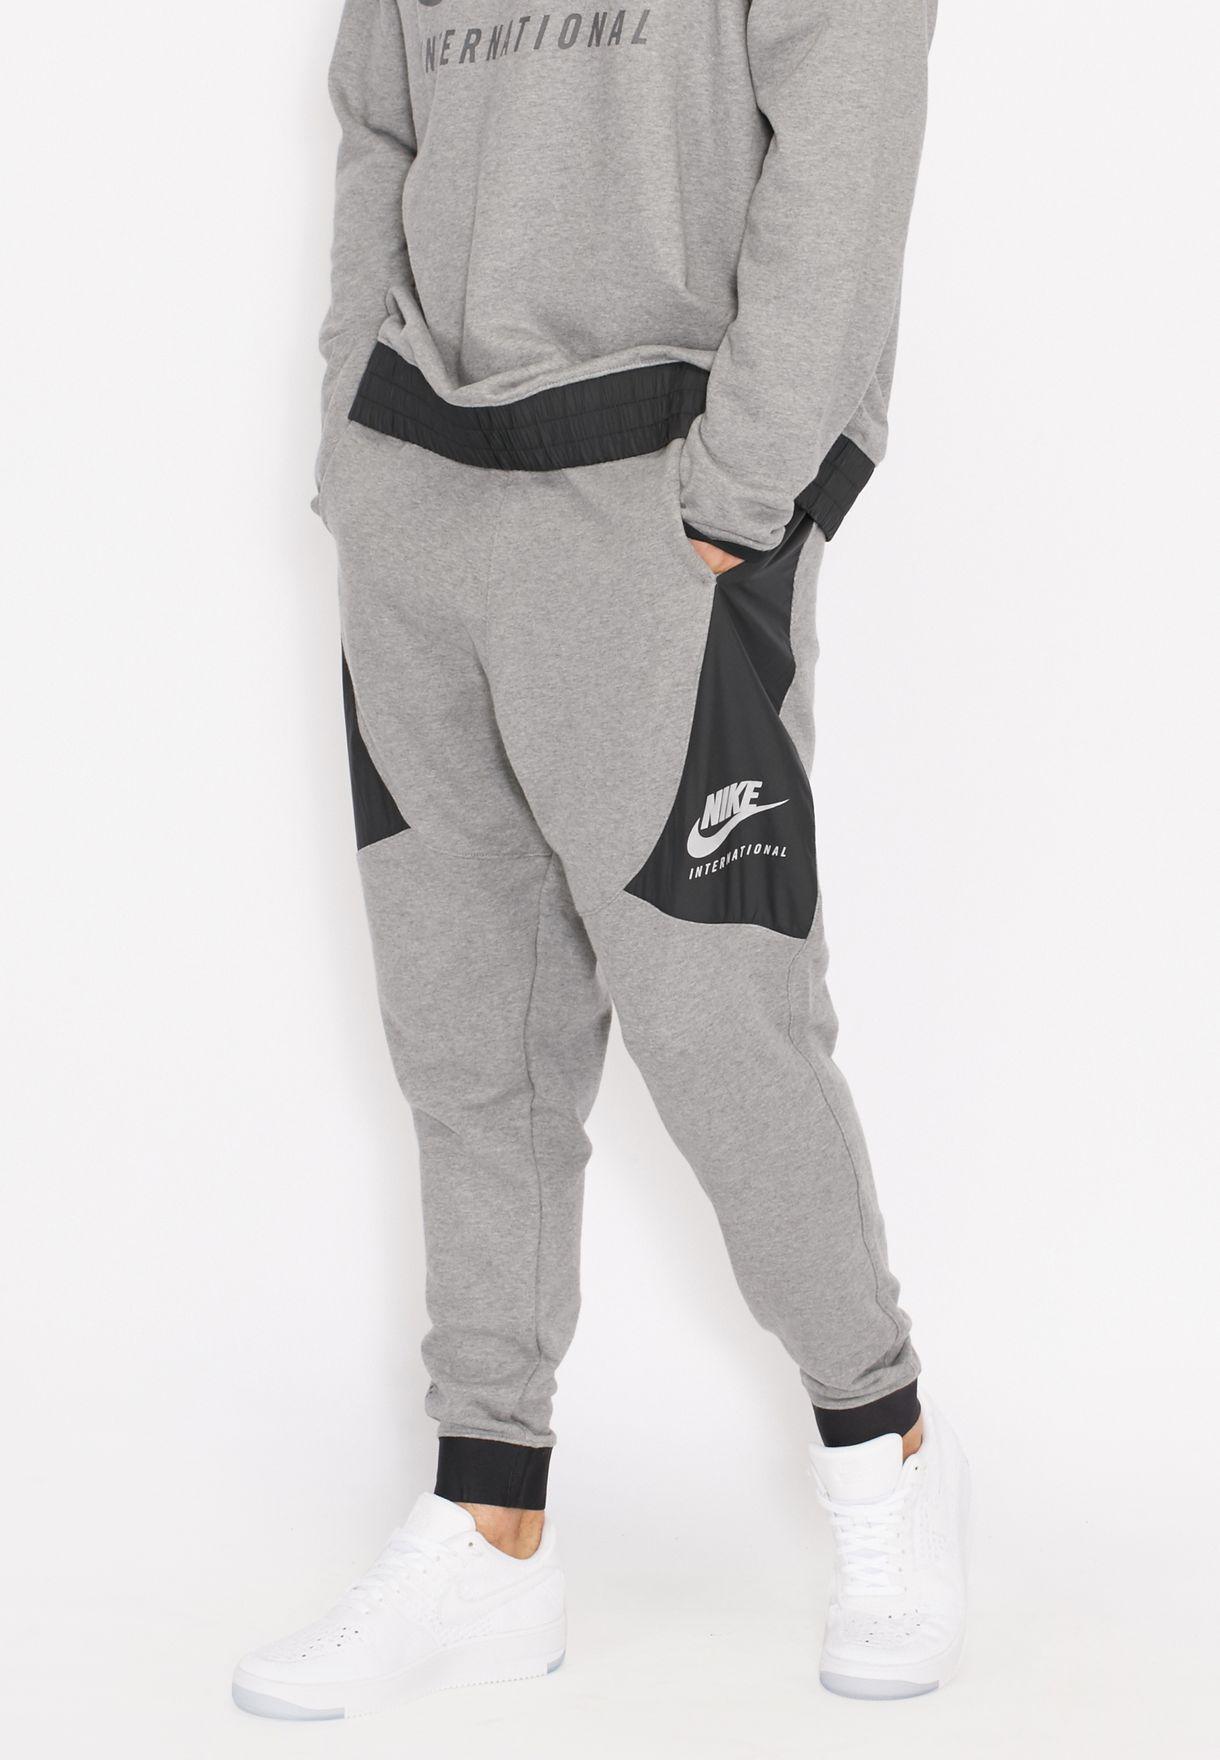 1c1949f588d5 Shop Nike grey International Cuffed Sweatpants 802375-091 for Men in ...